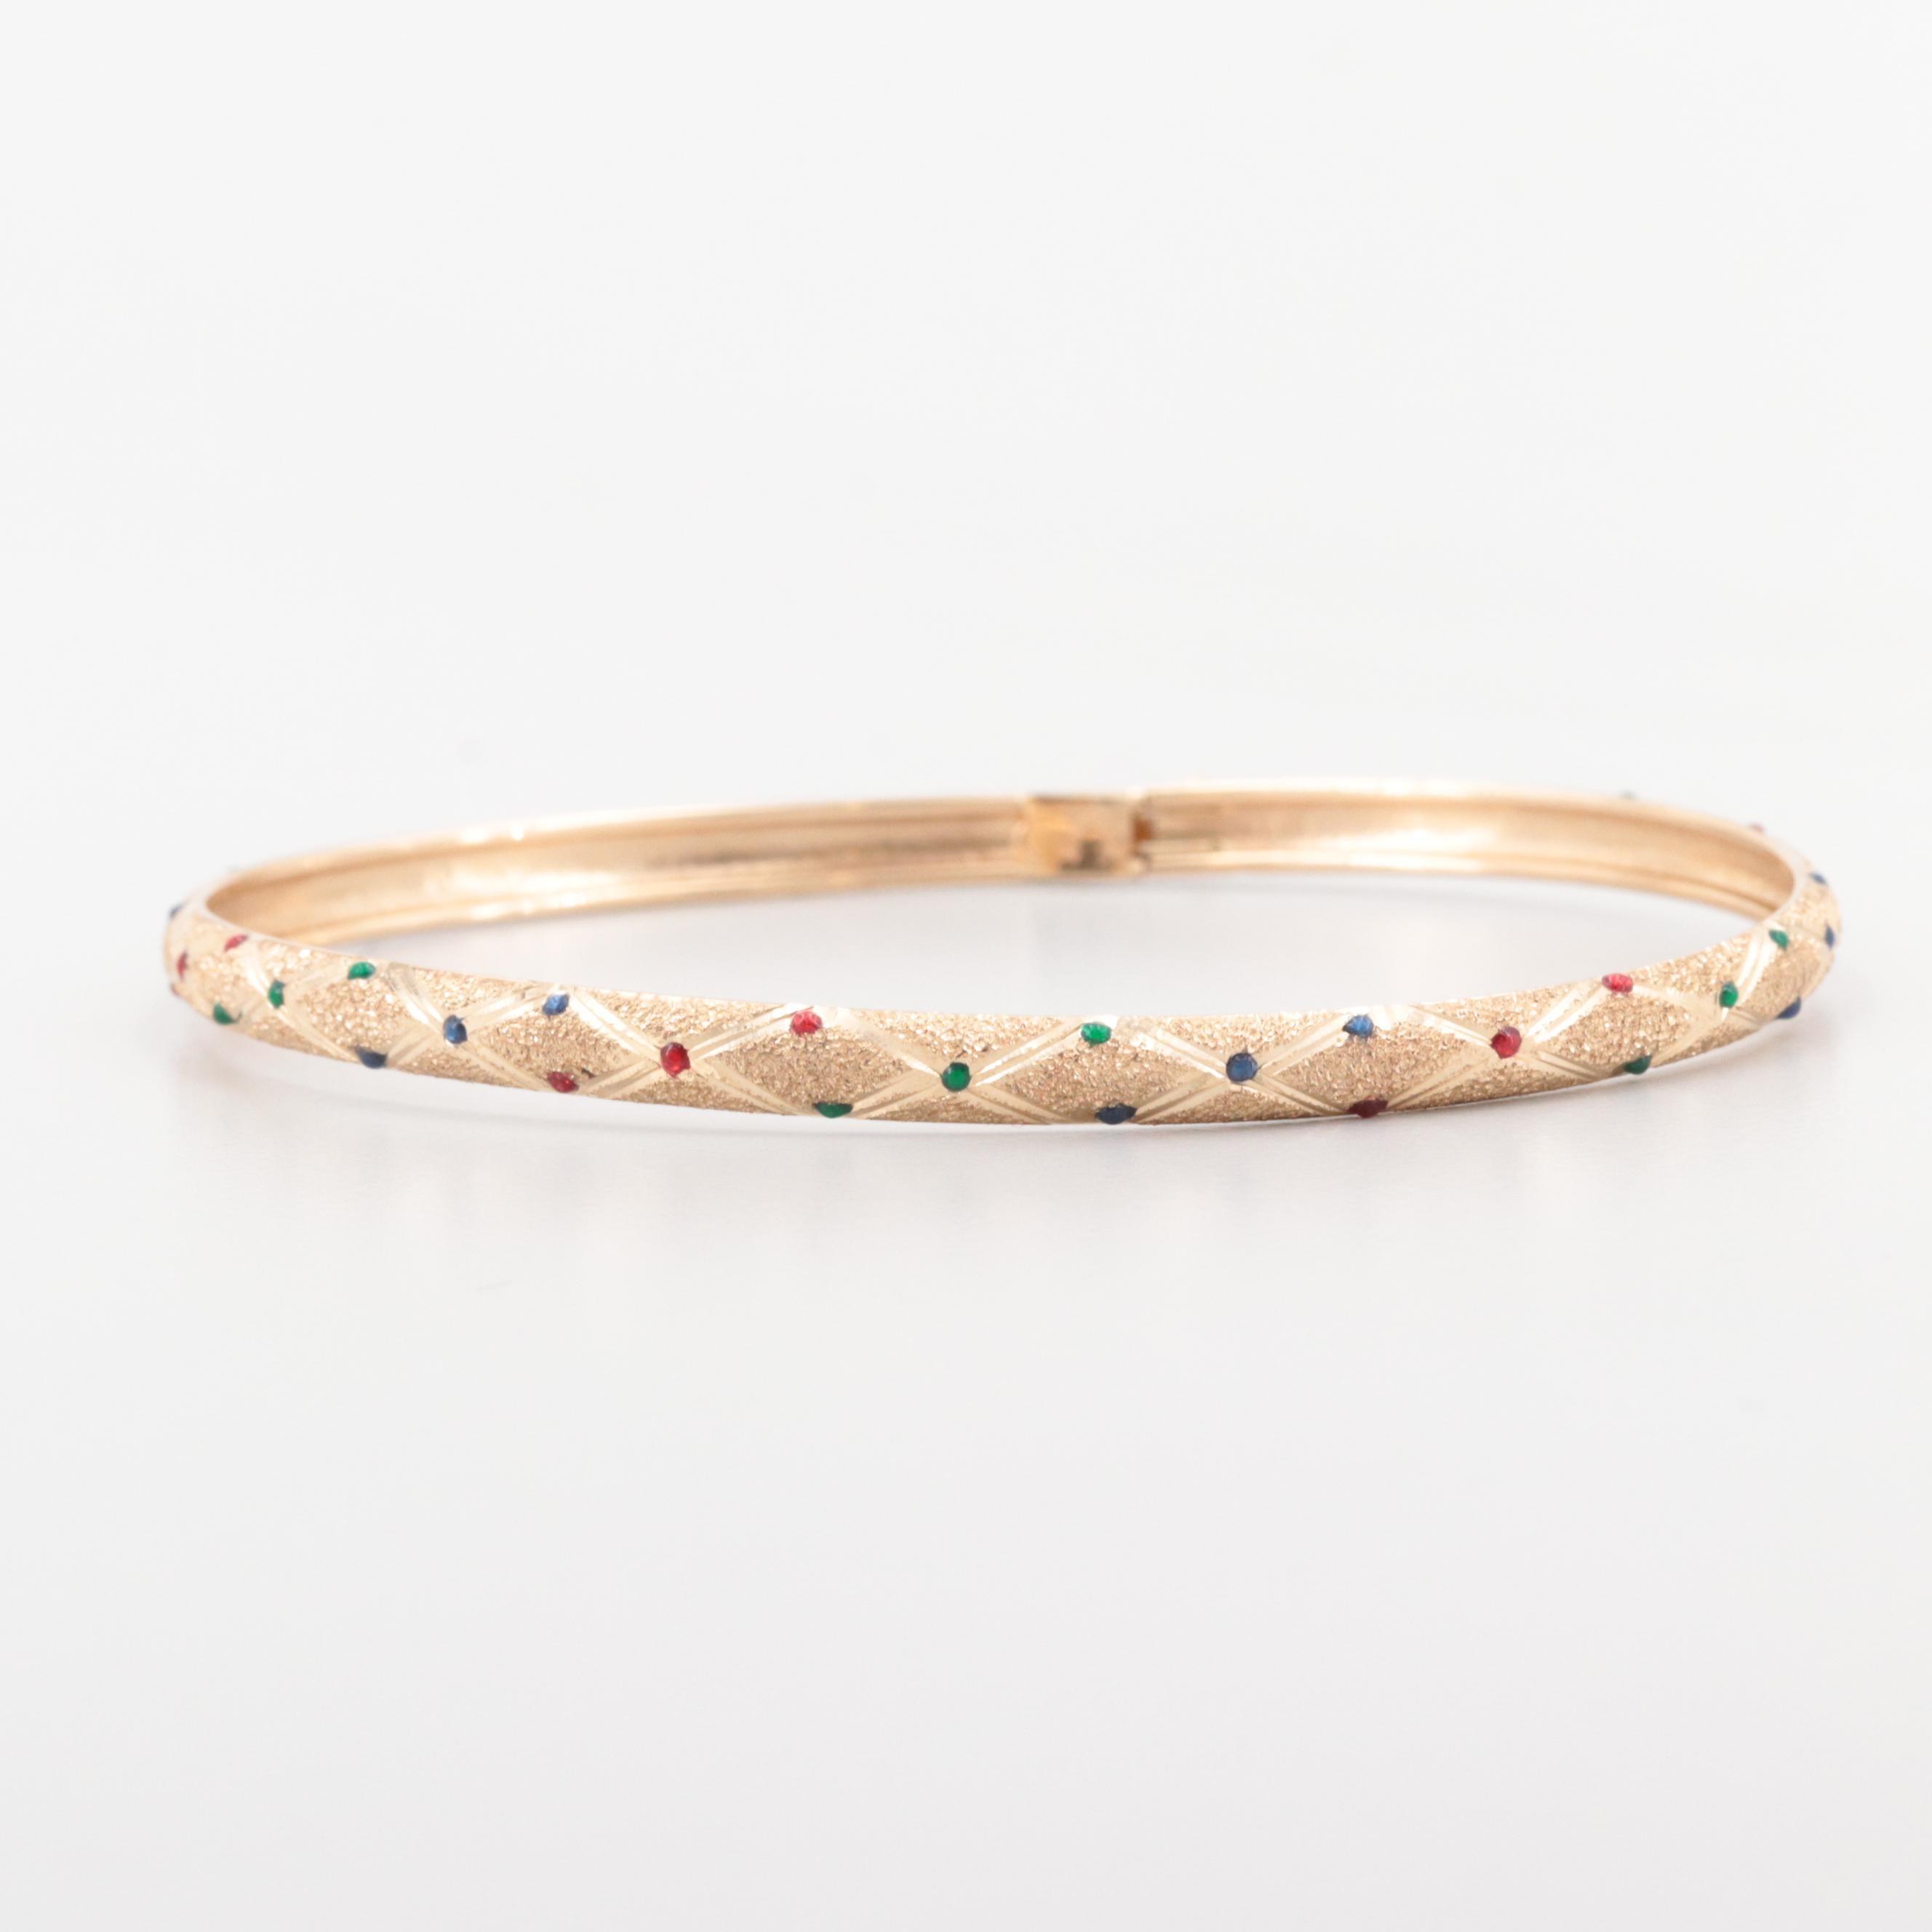 10K Yellow Gold Vitreous Enamel Engraved Bangle Bracelet